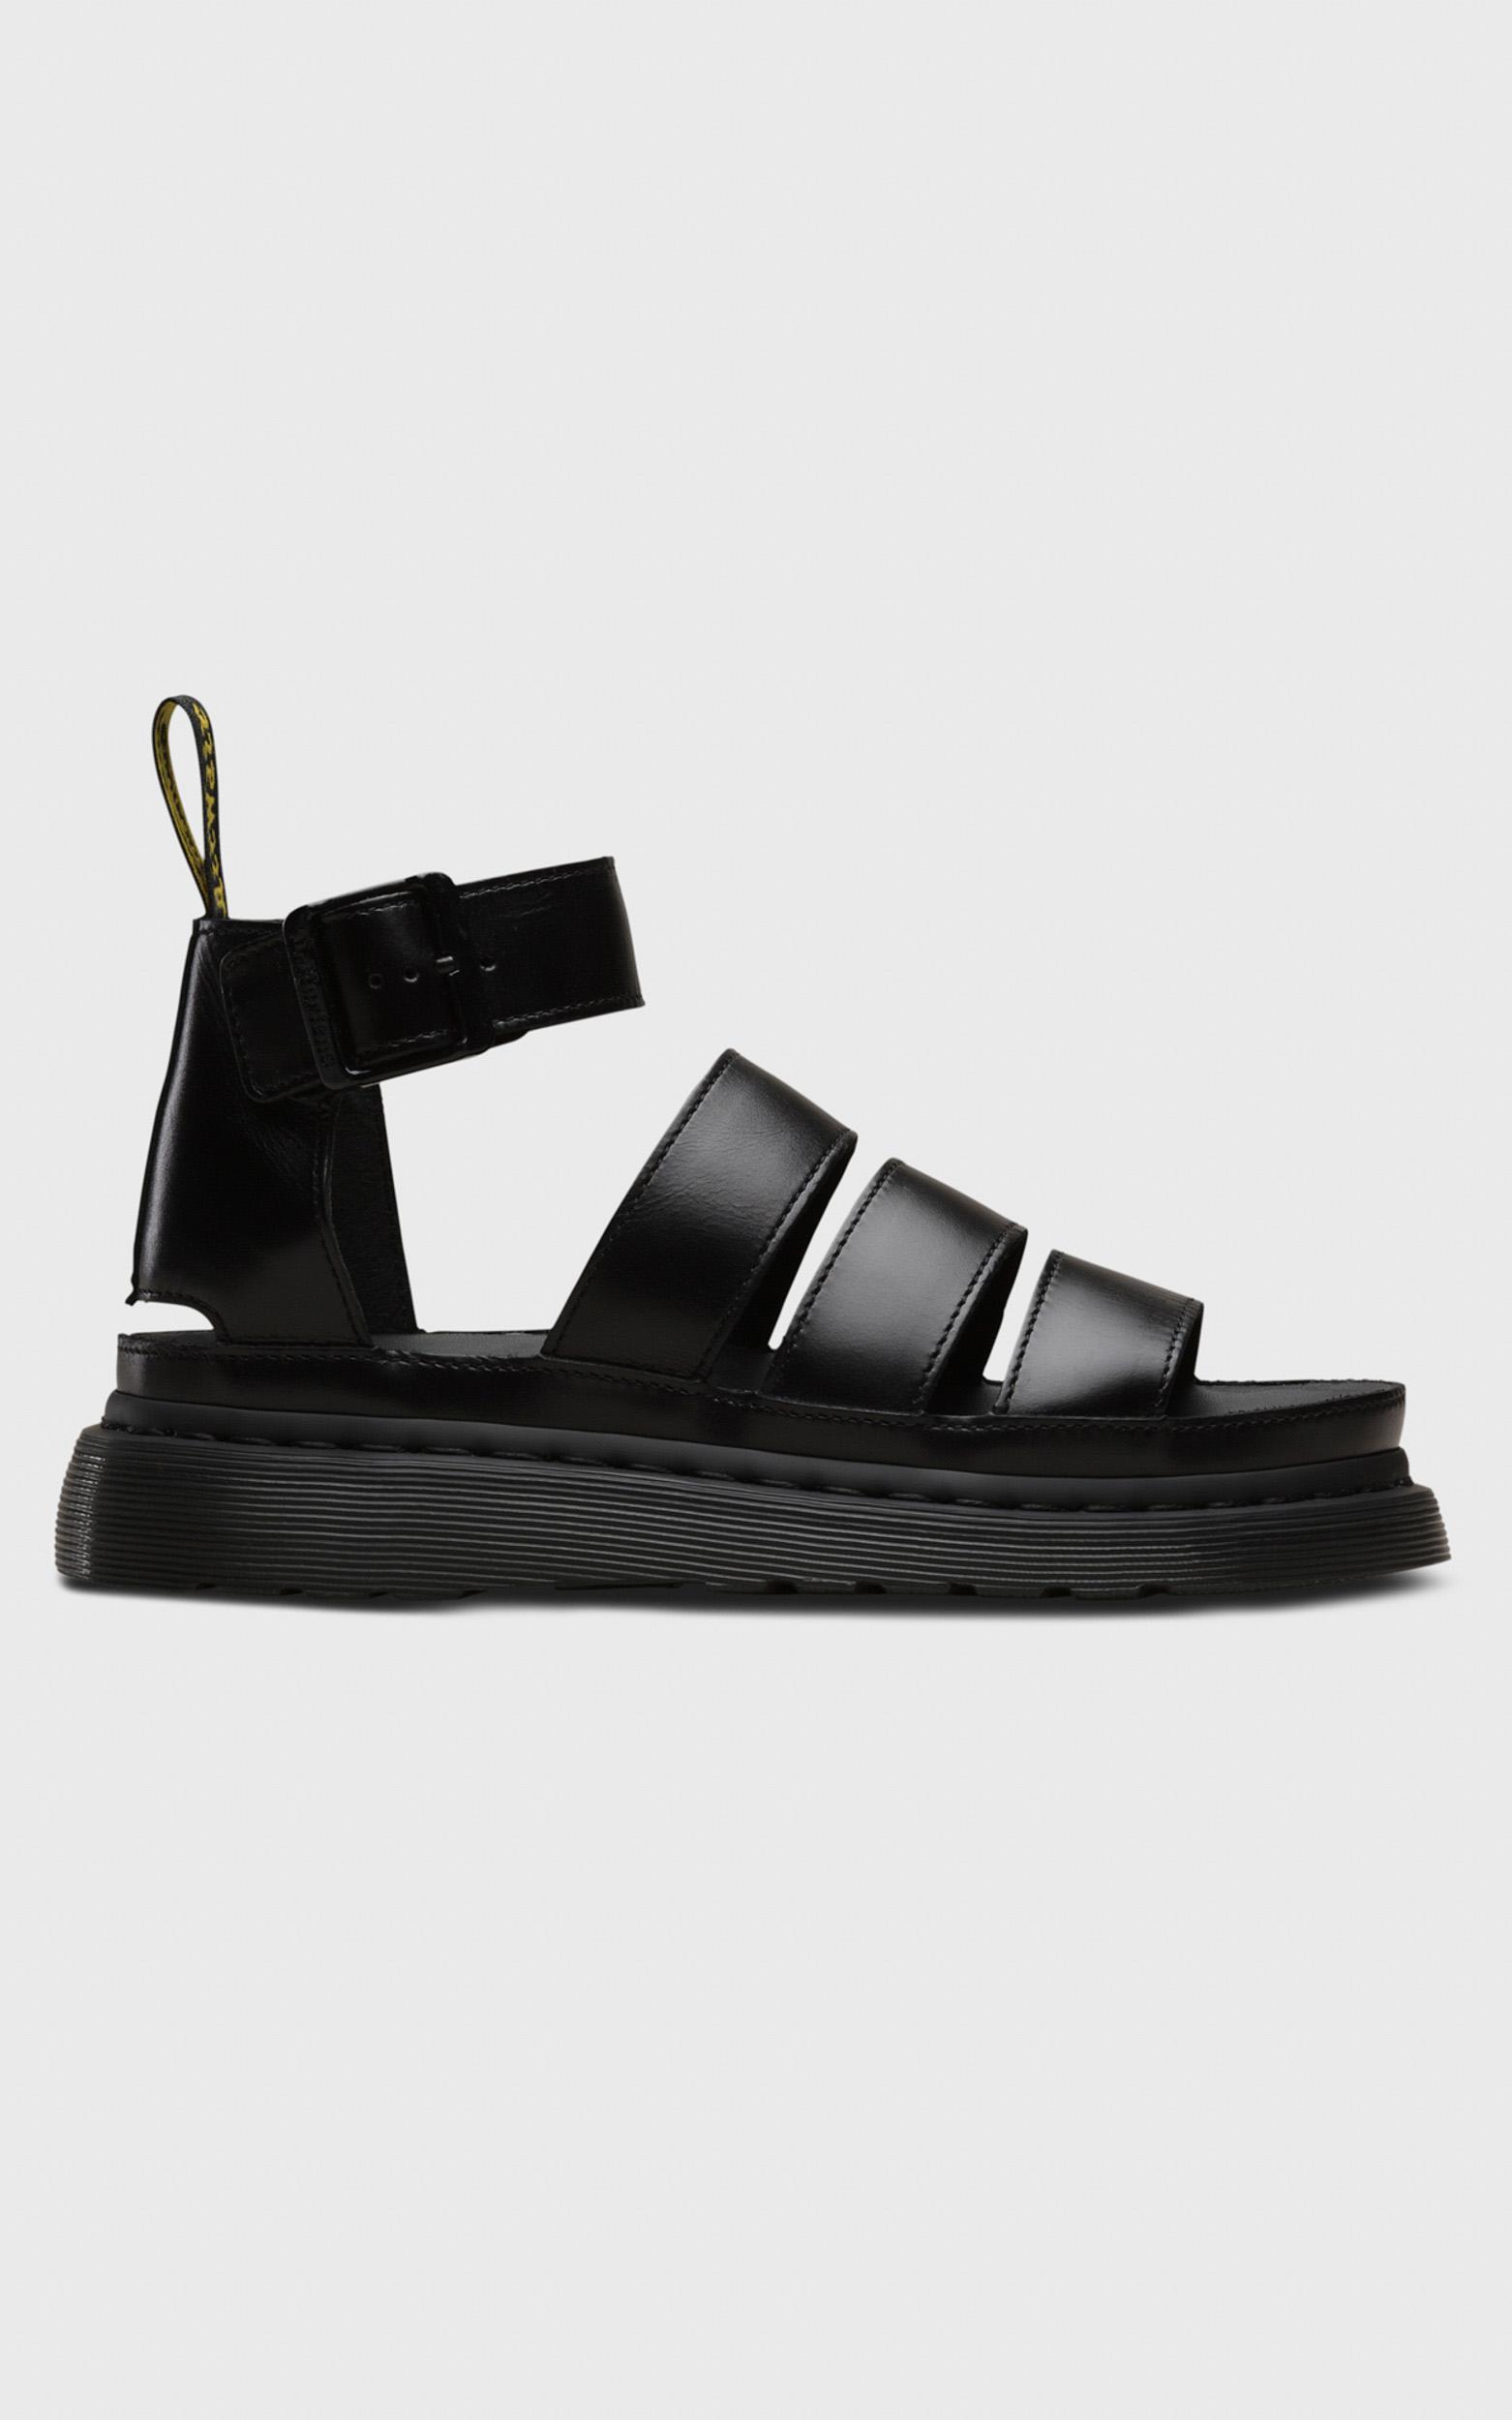 Dr. Martens - Clarissa II Chunky 3 Strap Sandal in Black Brando - 5, Black, hi-res image number null